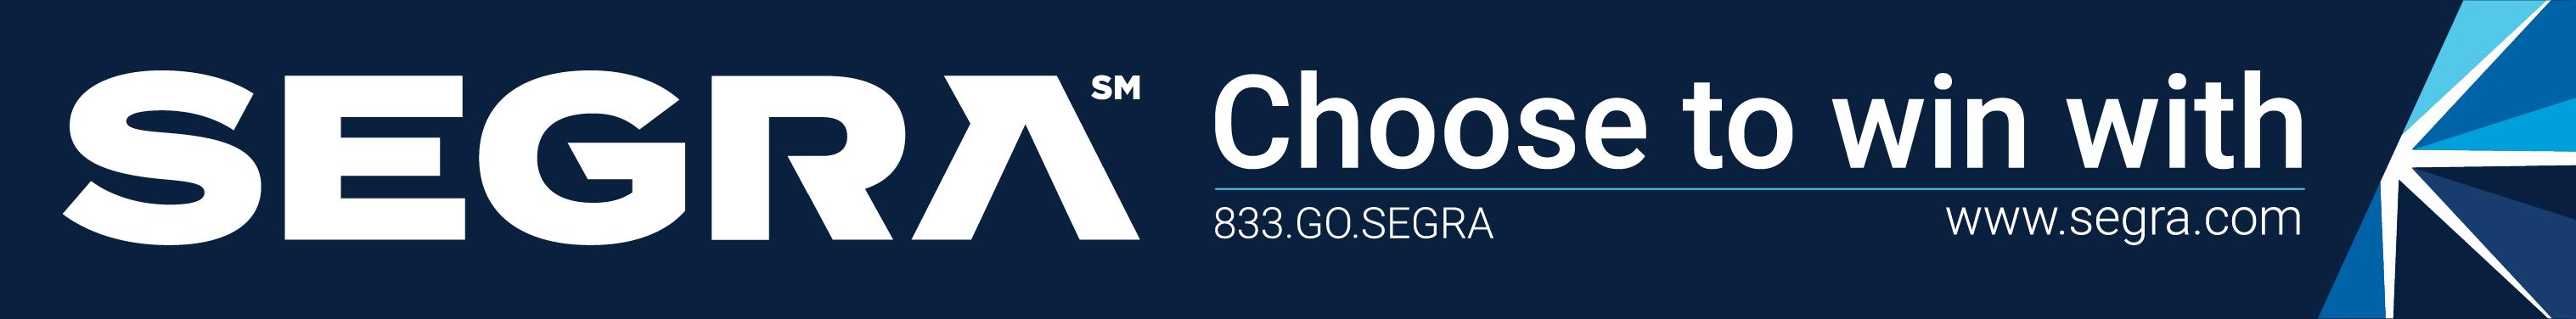 Segra Digital Ad 728x90-04.png